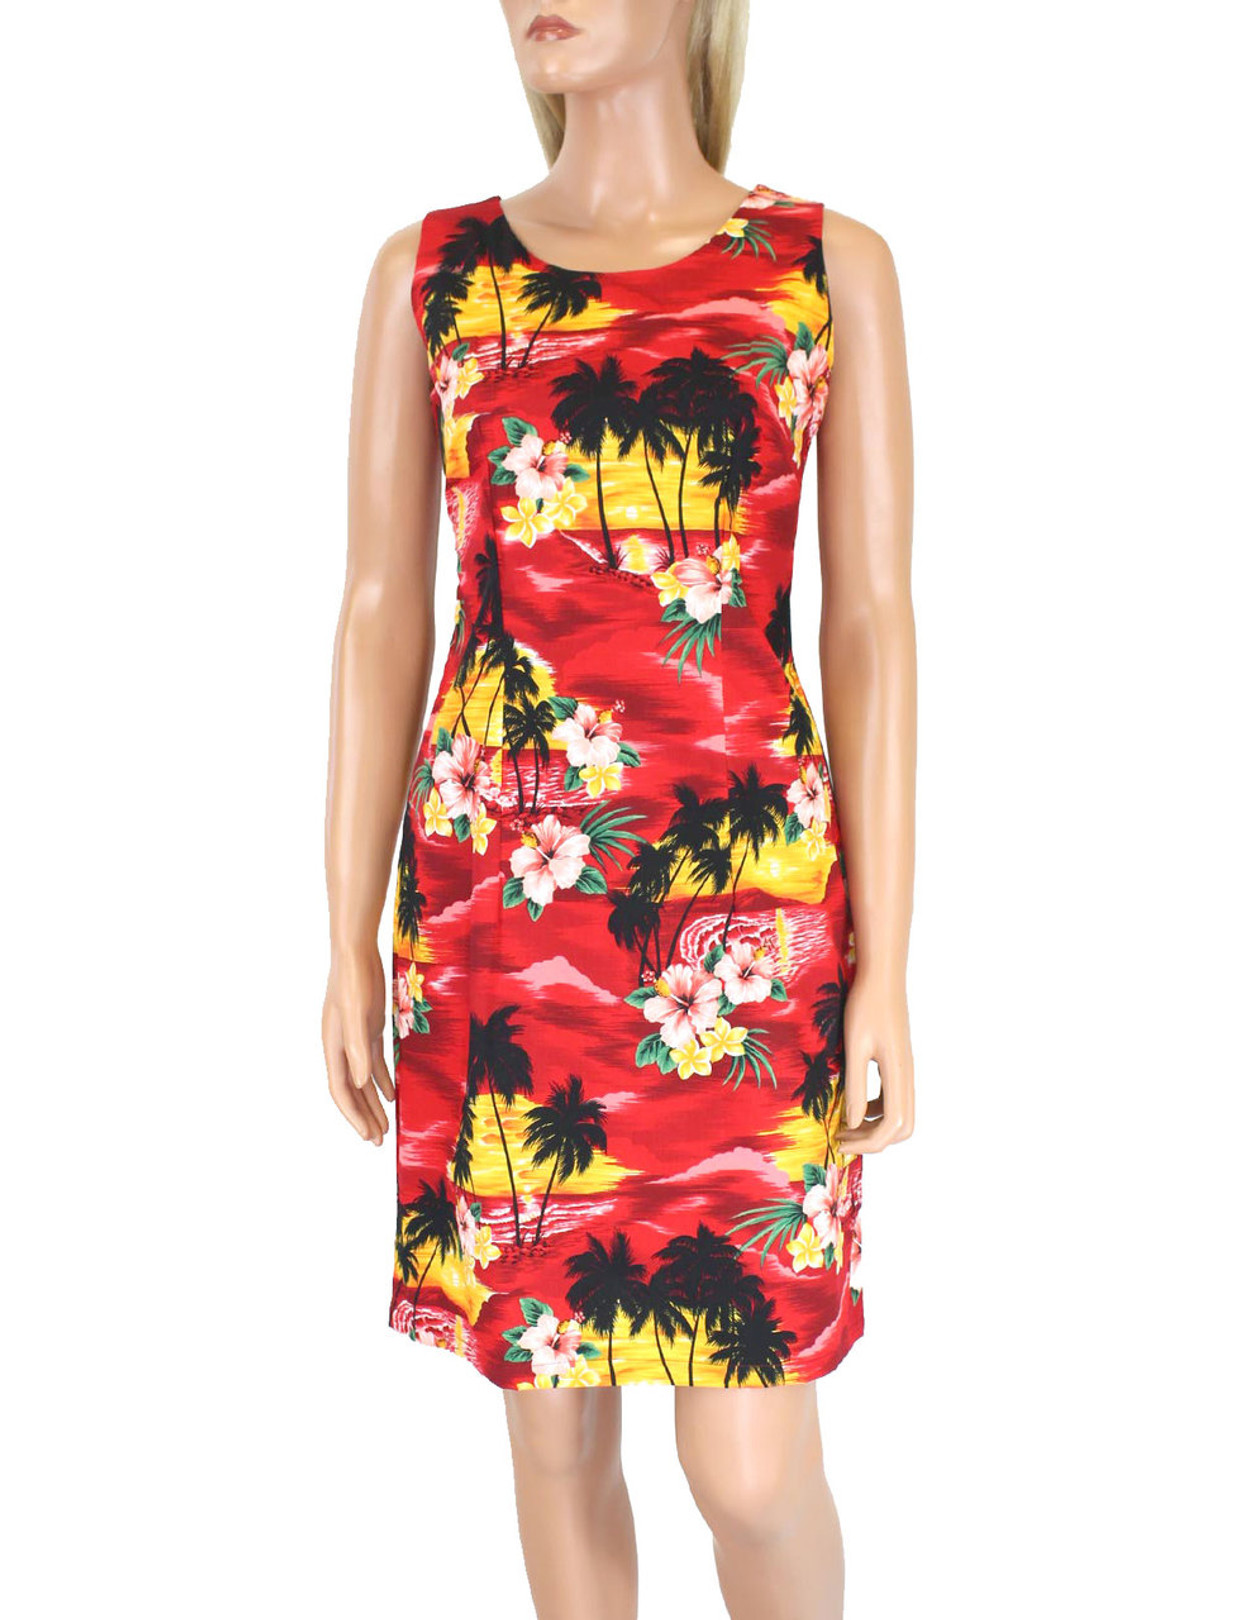 5bfff998d4a09 Hawaiian Short Island Sunset Tank Dress 100% Cotton Fabric Care  Machine  Wash Cold